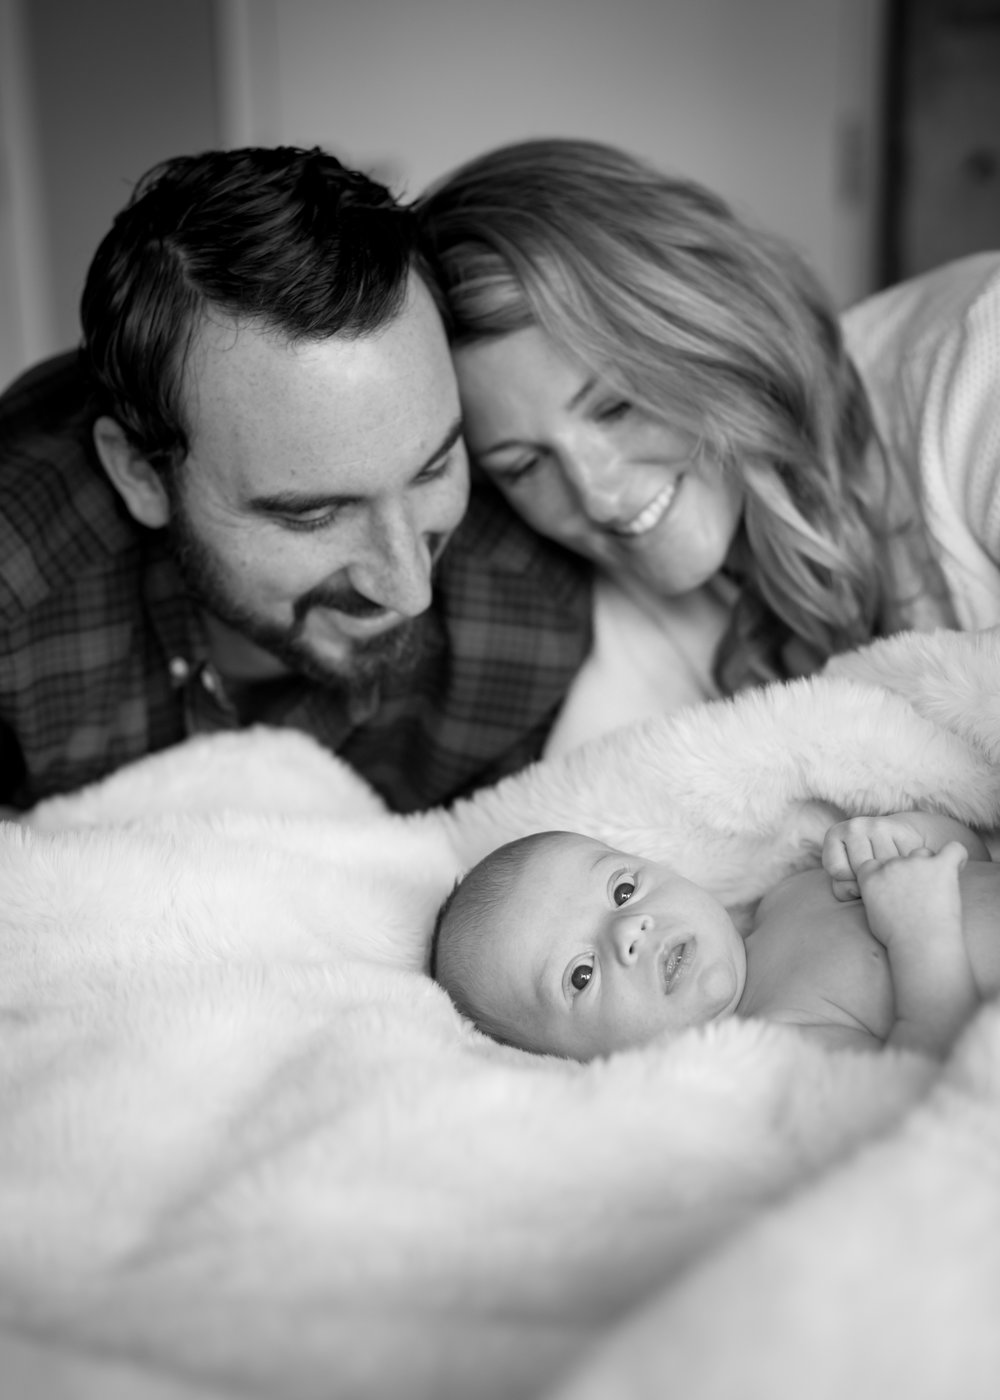 Tacoma_Family_Photographer_Newborn-3.jpg